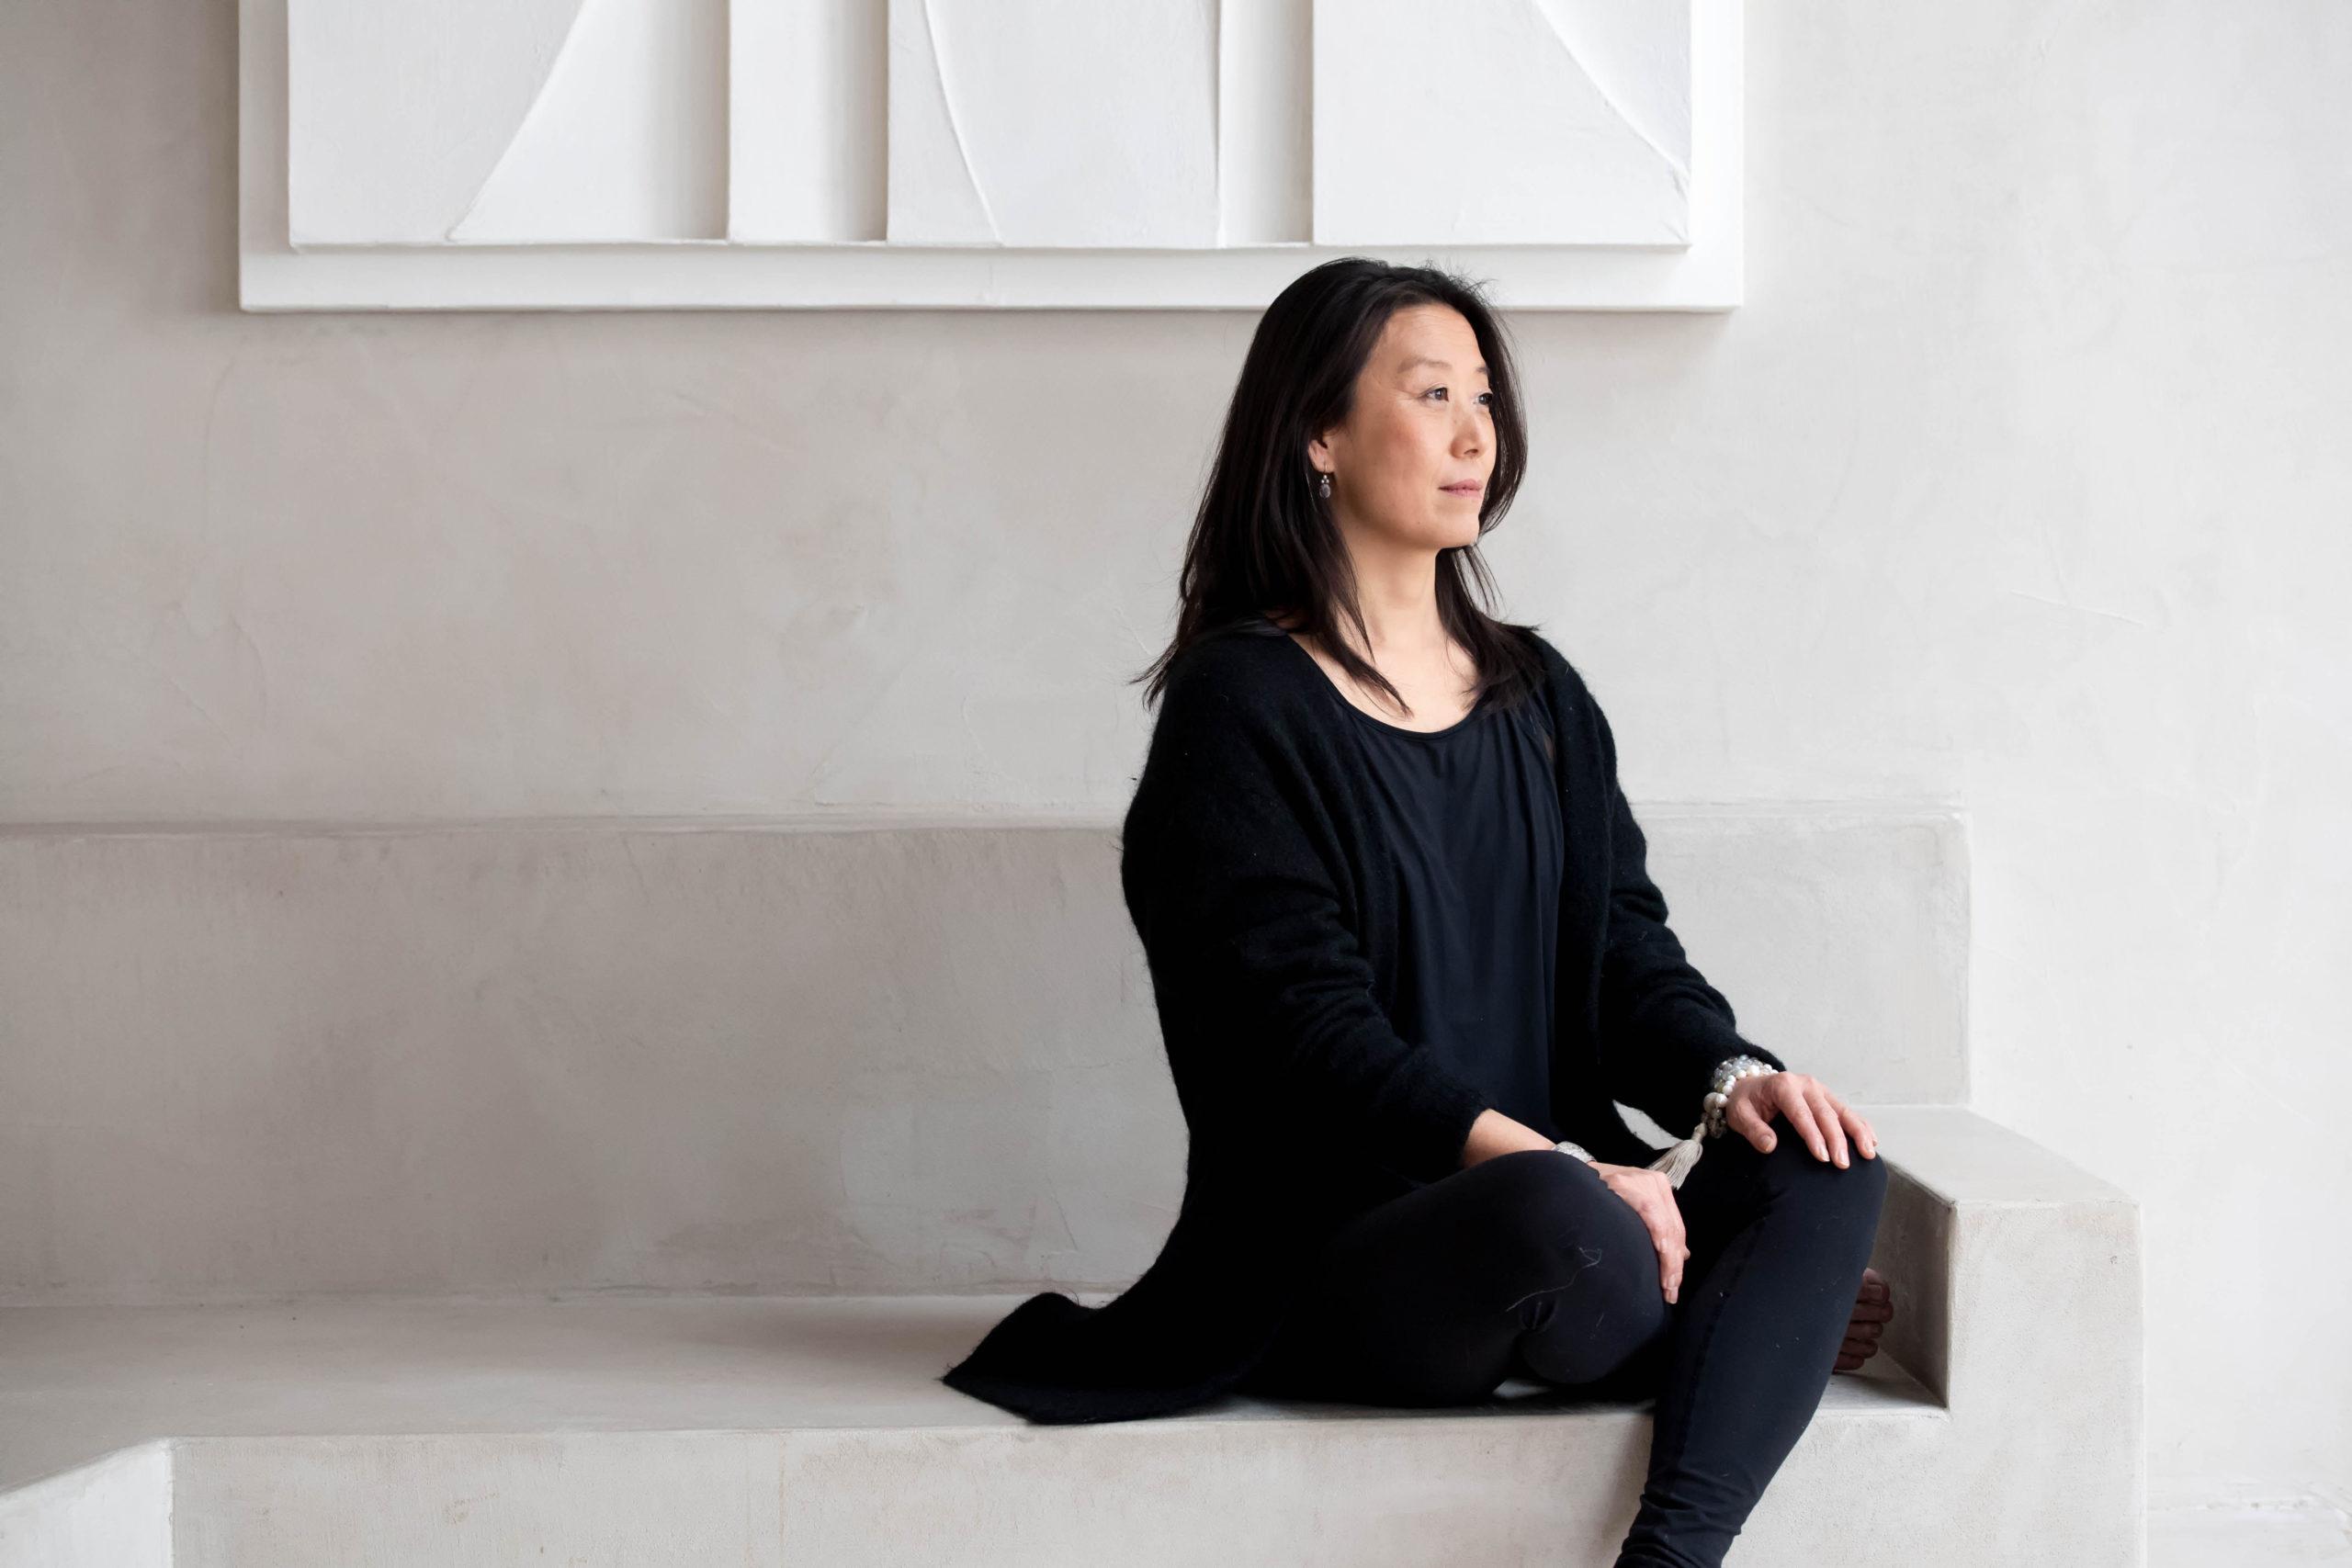 mindfulness meditatie, karianne kraaijestein, yoga, stilte